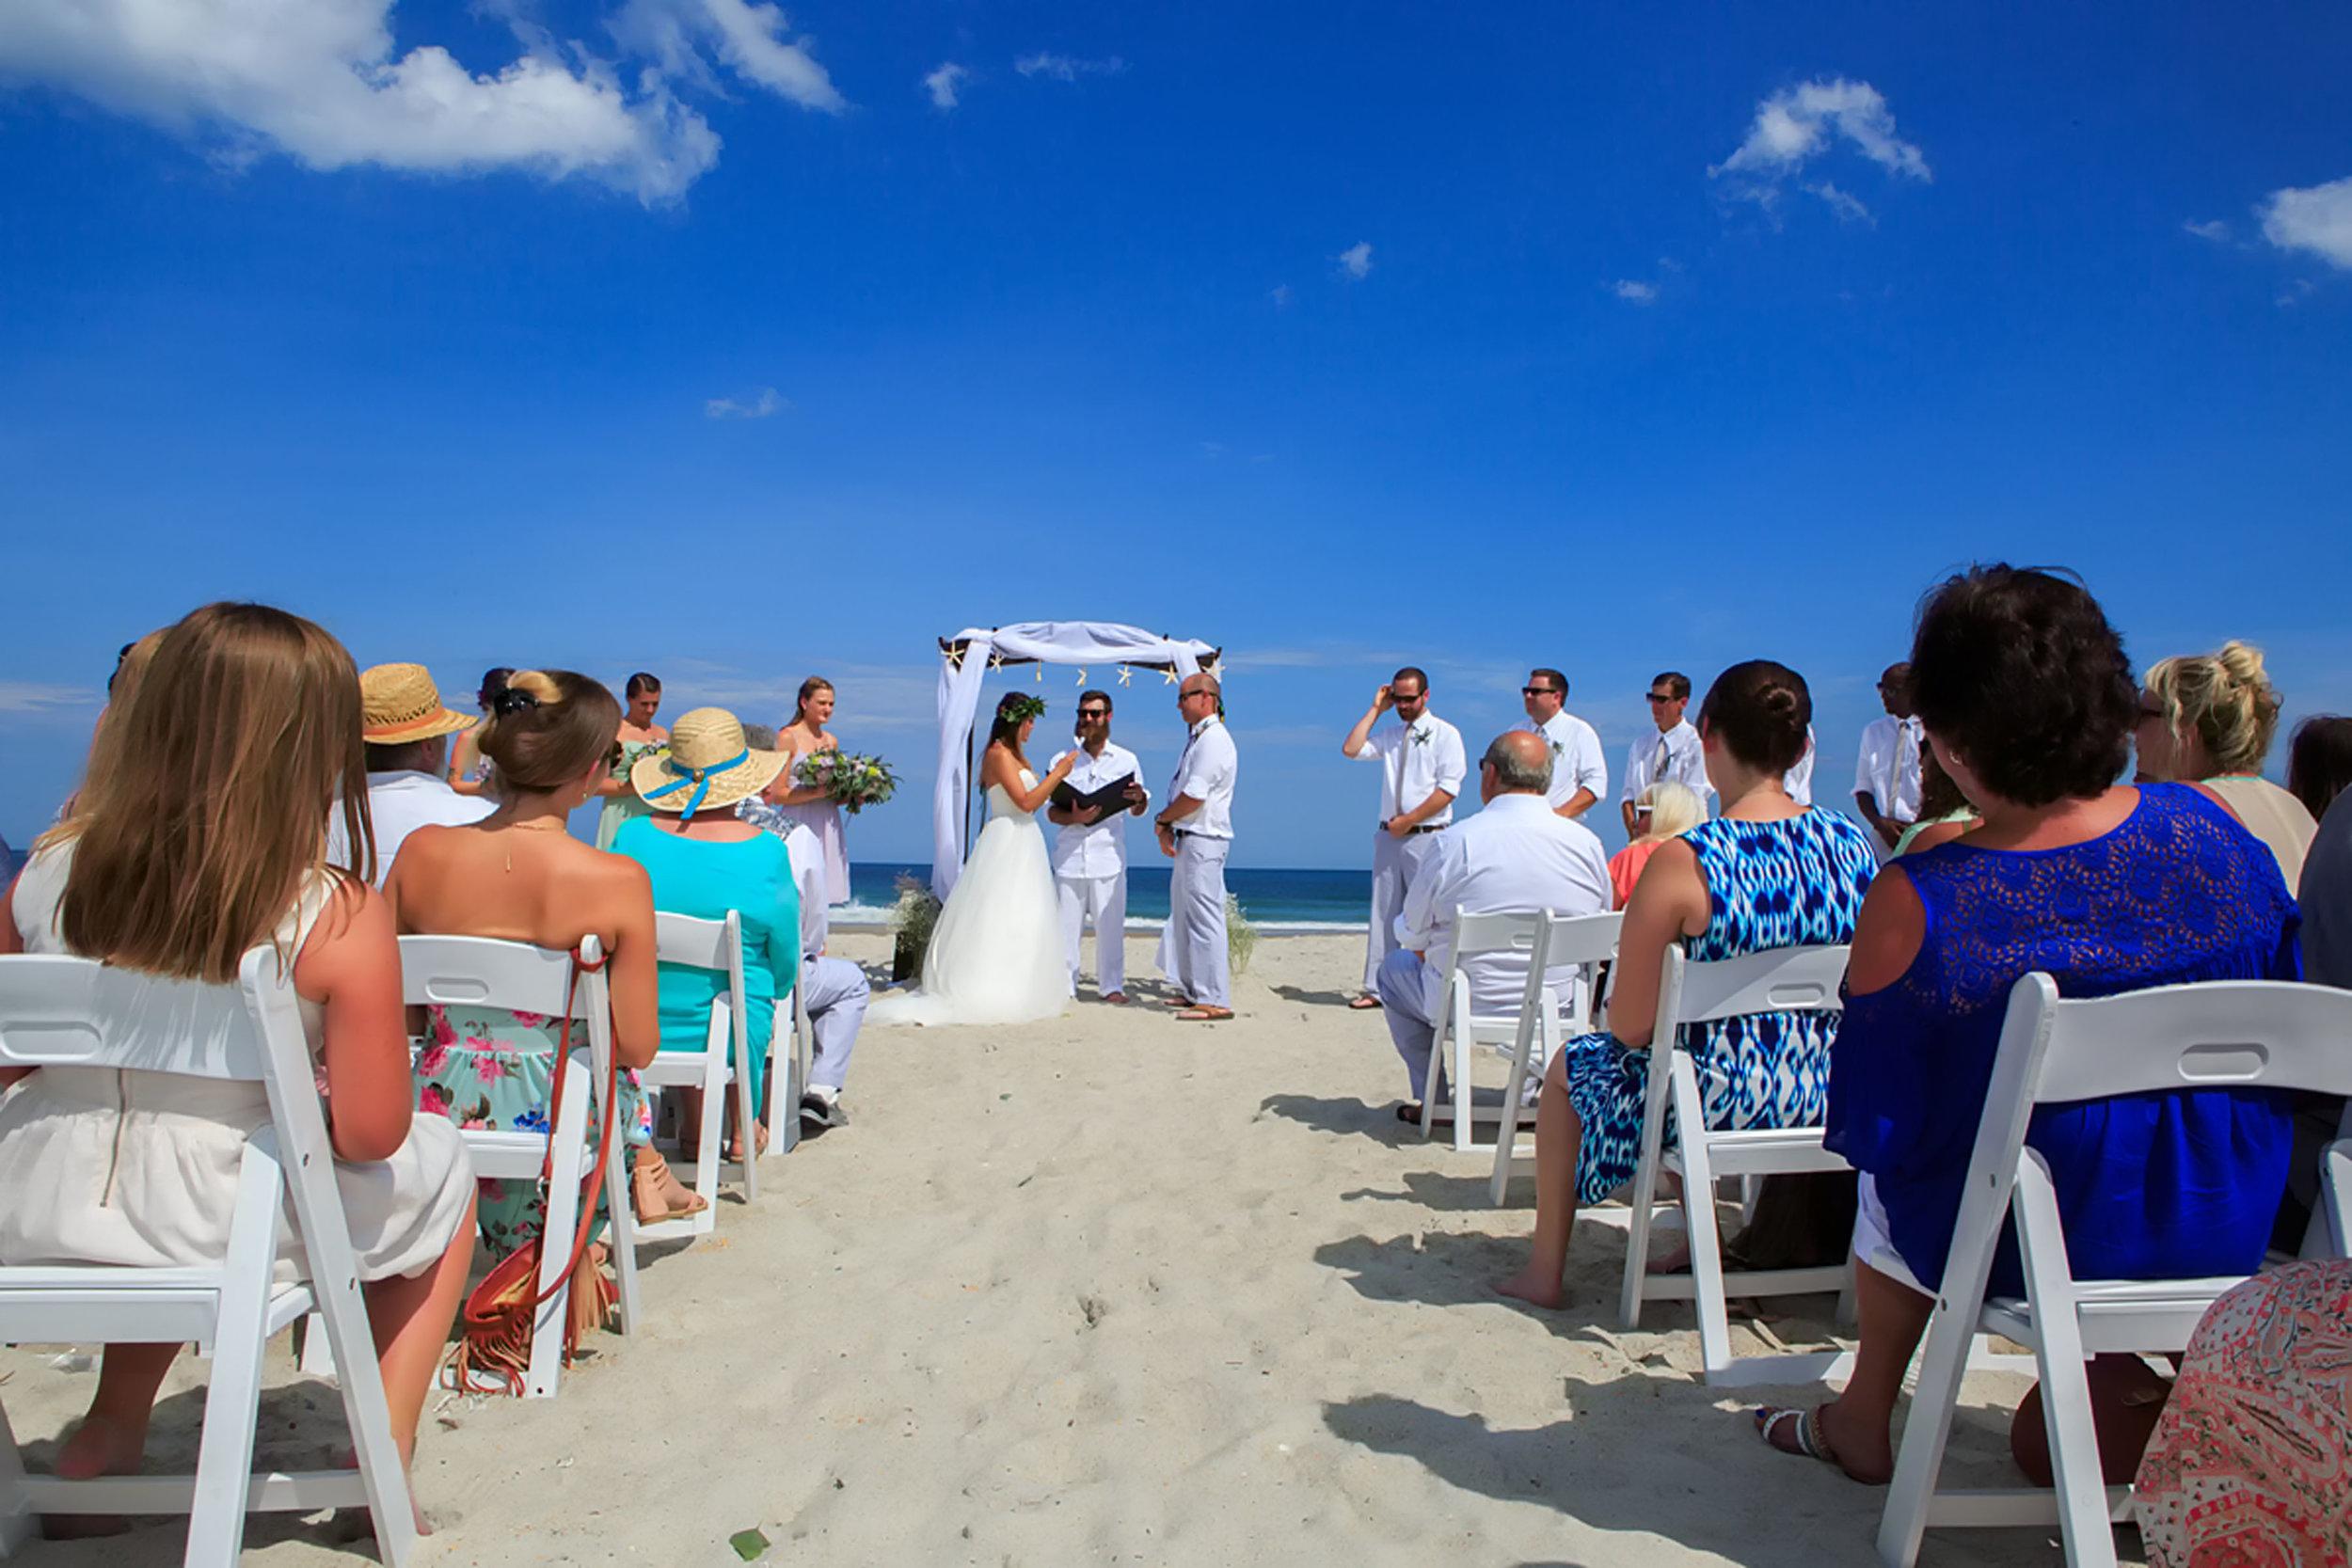 North_Carolina_Wedding_Photographer_Tiffany_Abruzzo_Ceremony_44.jpg